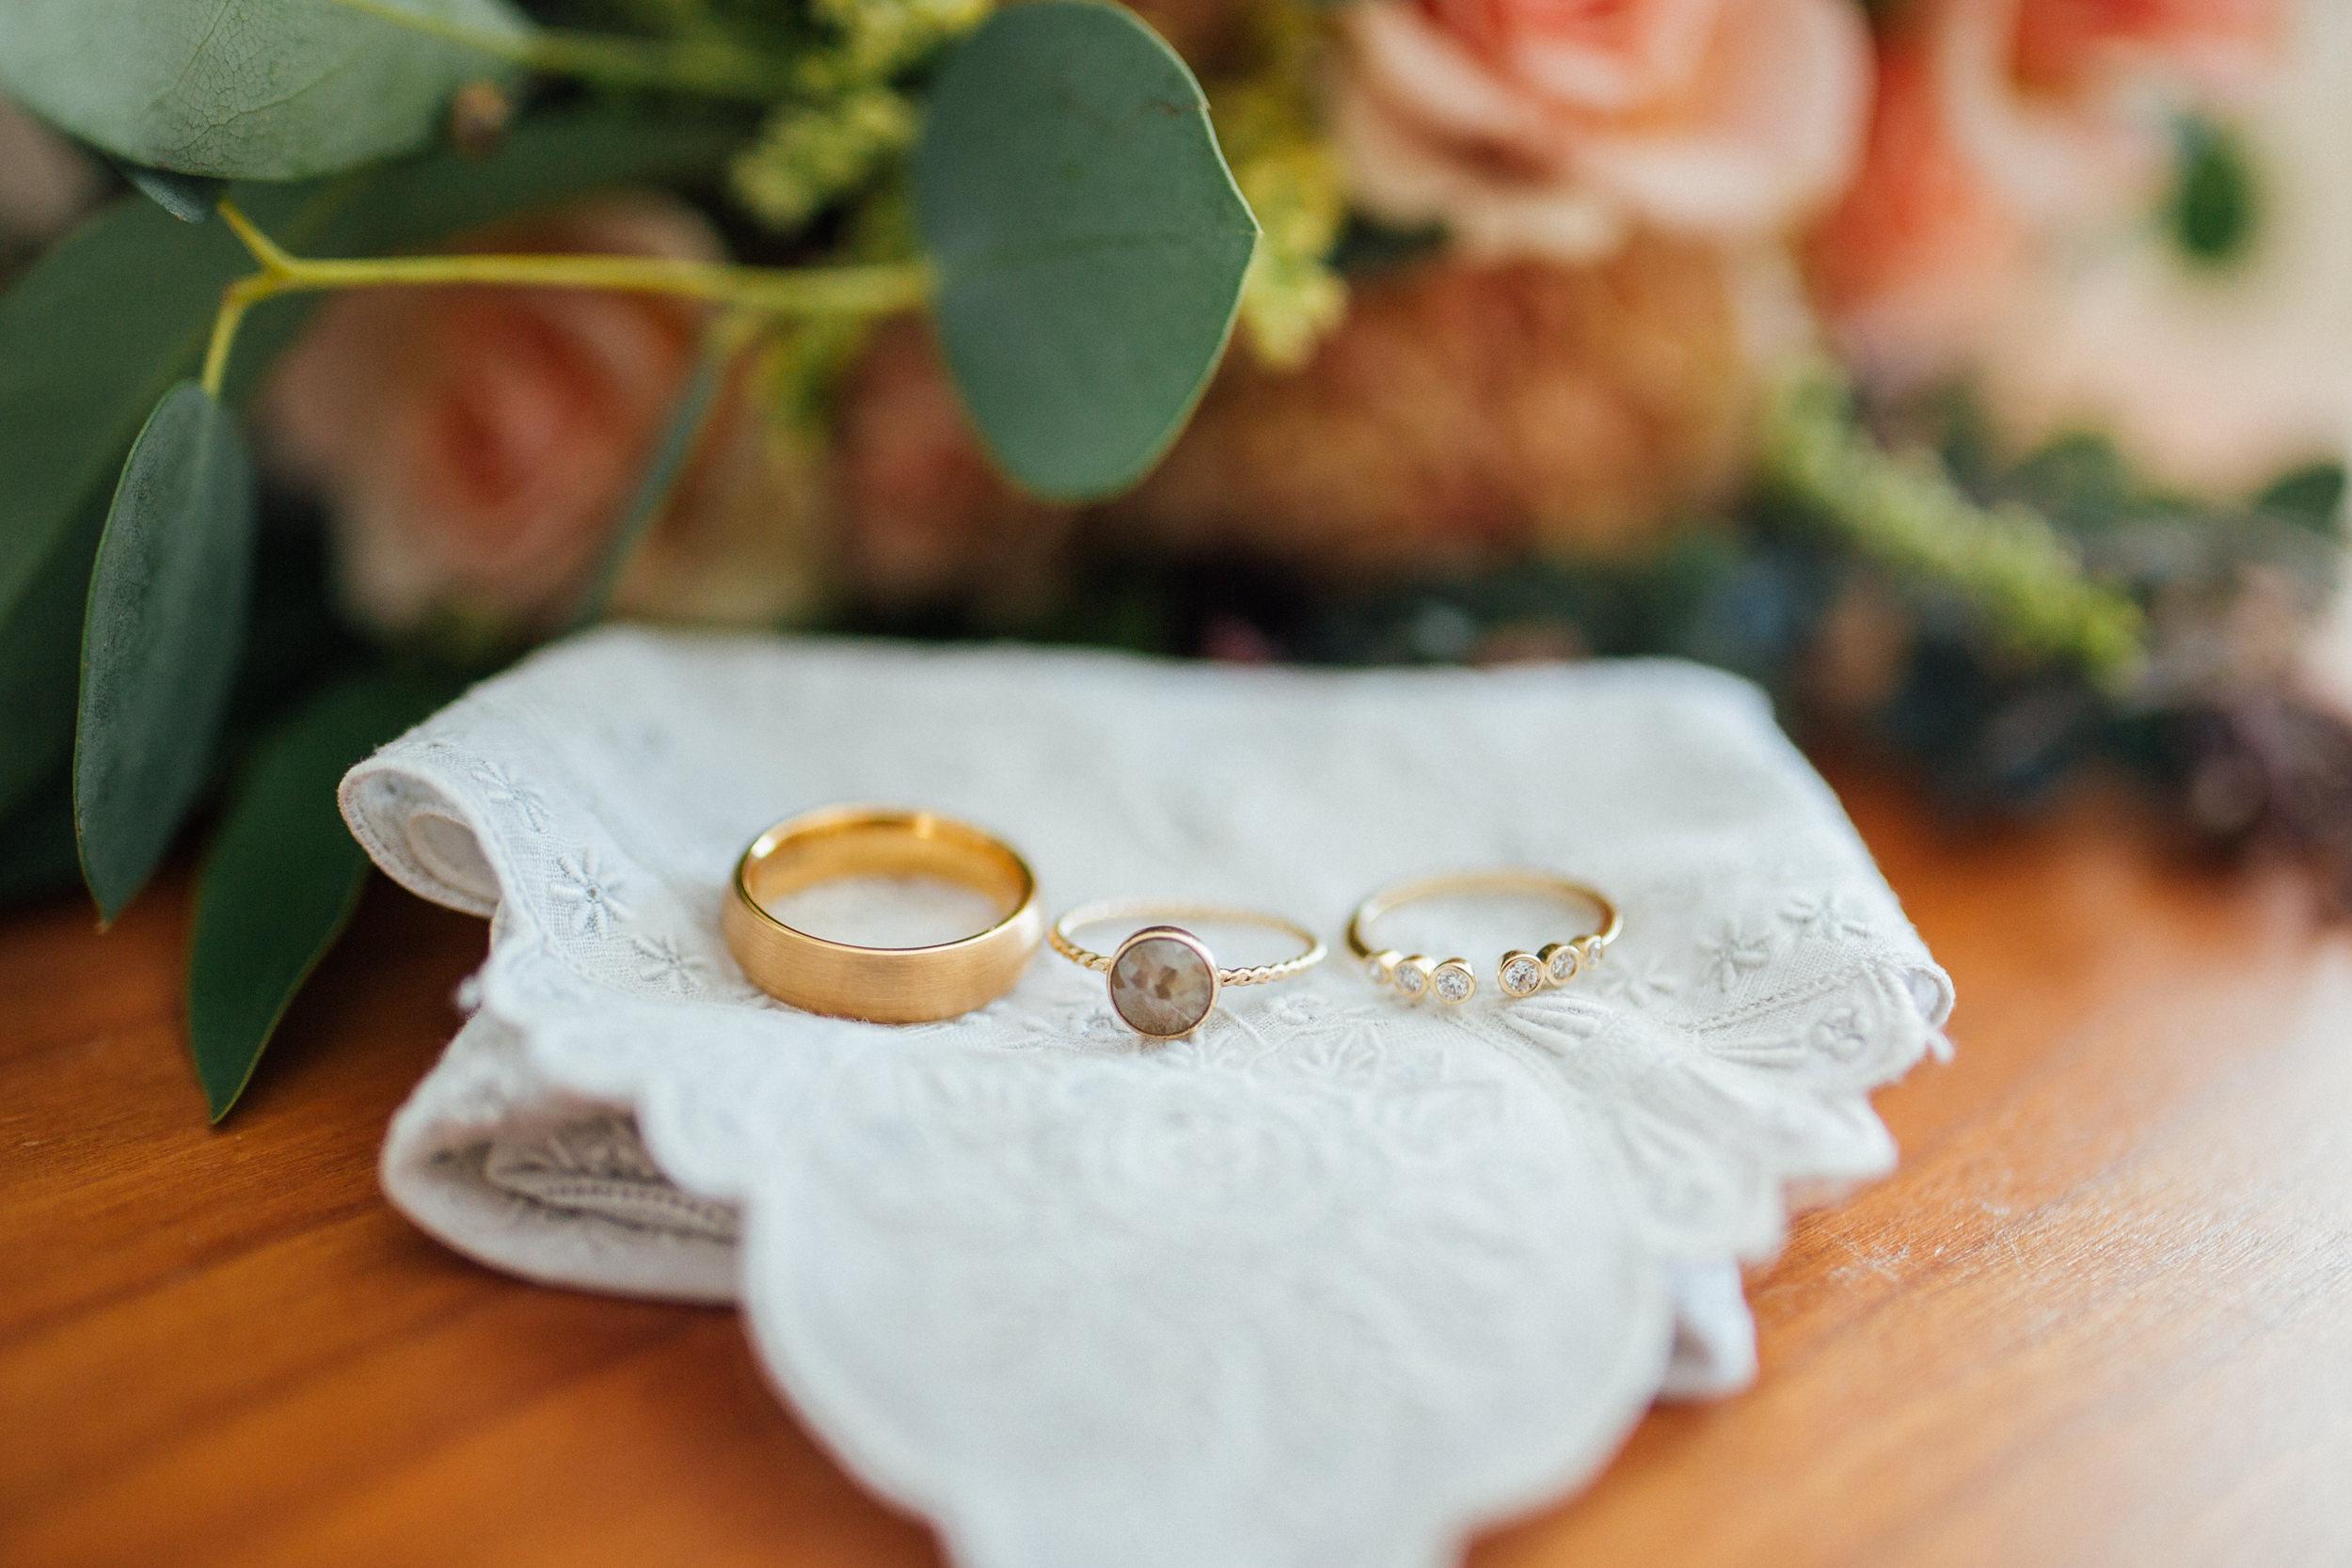 Colorado Wedding Rings-Denver Home Wedding